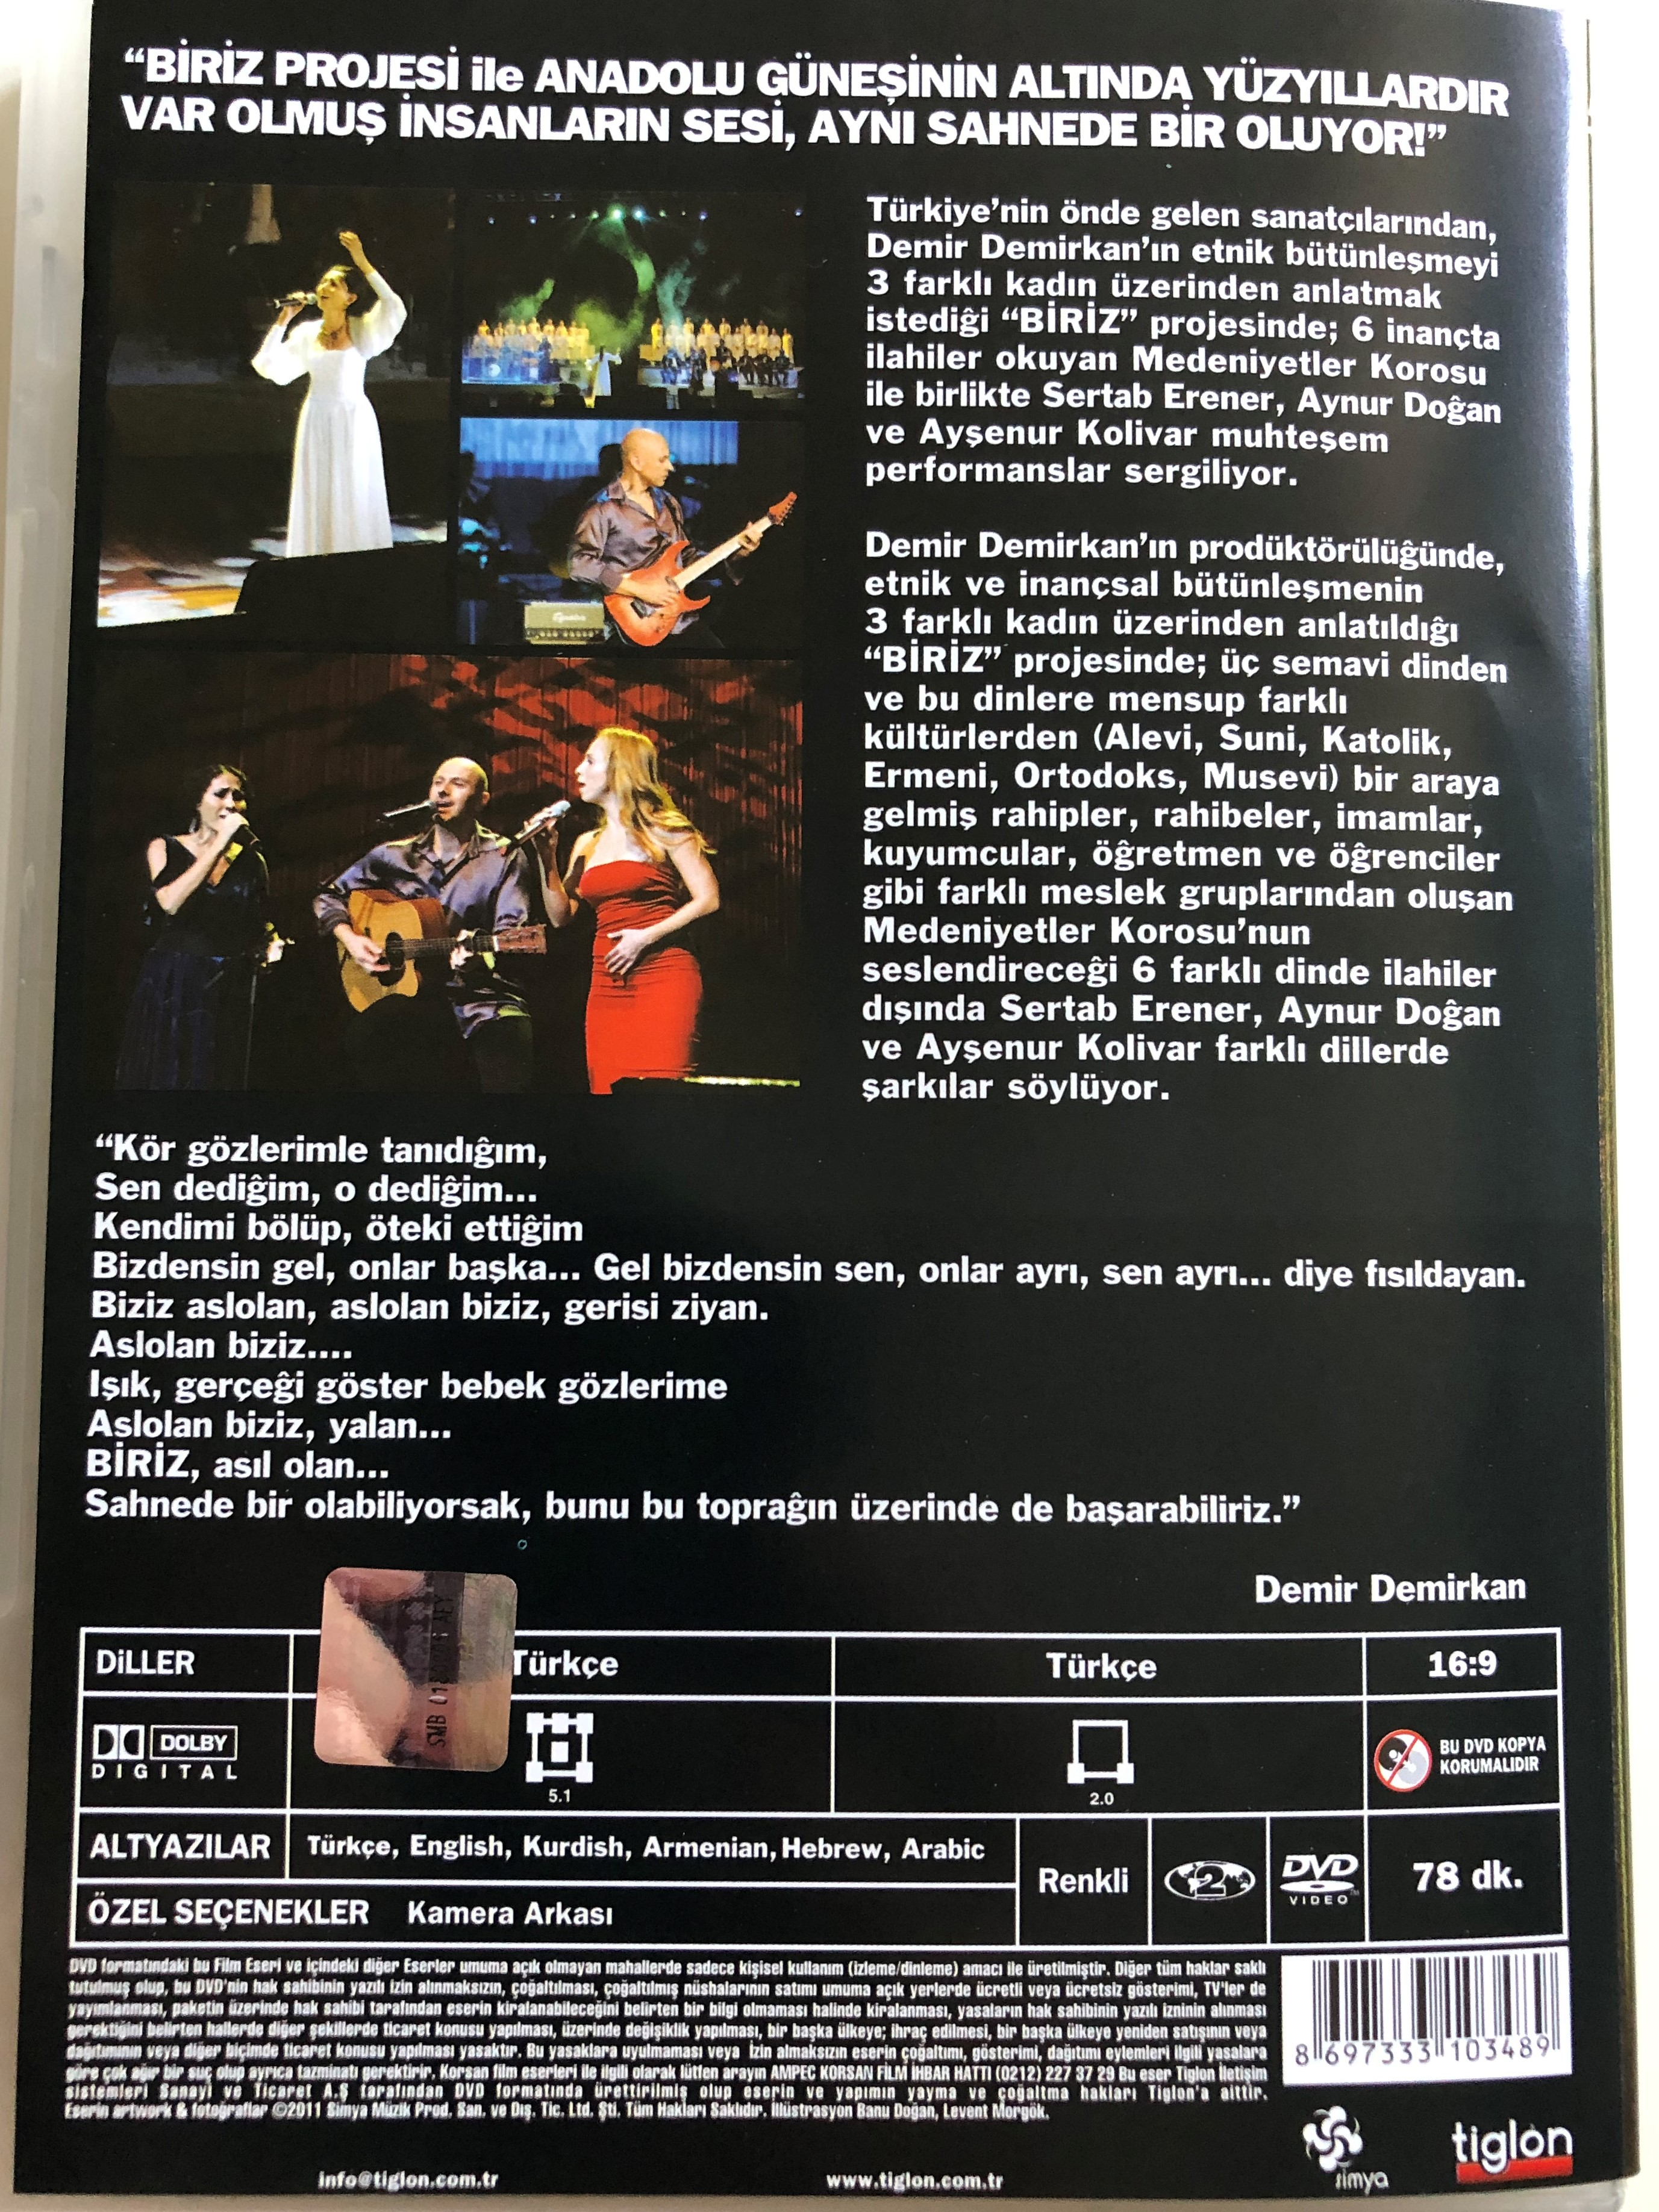 demir-demirkan-em-yek-in-ar-voret-biriz-concert-dvd-2010-sertab-erener-antakya-medeniyetler-korosu-aynur-dogan-aysenur-kolivar-2-.jpg